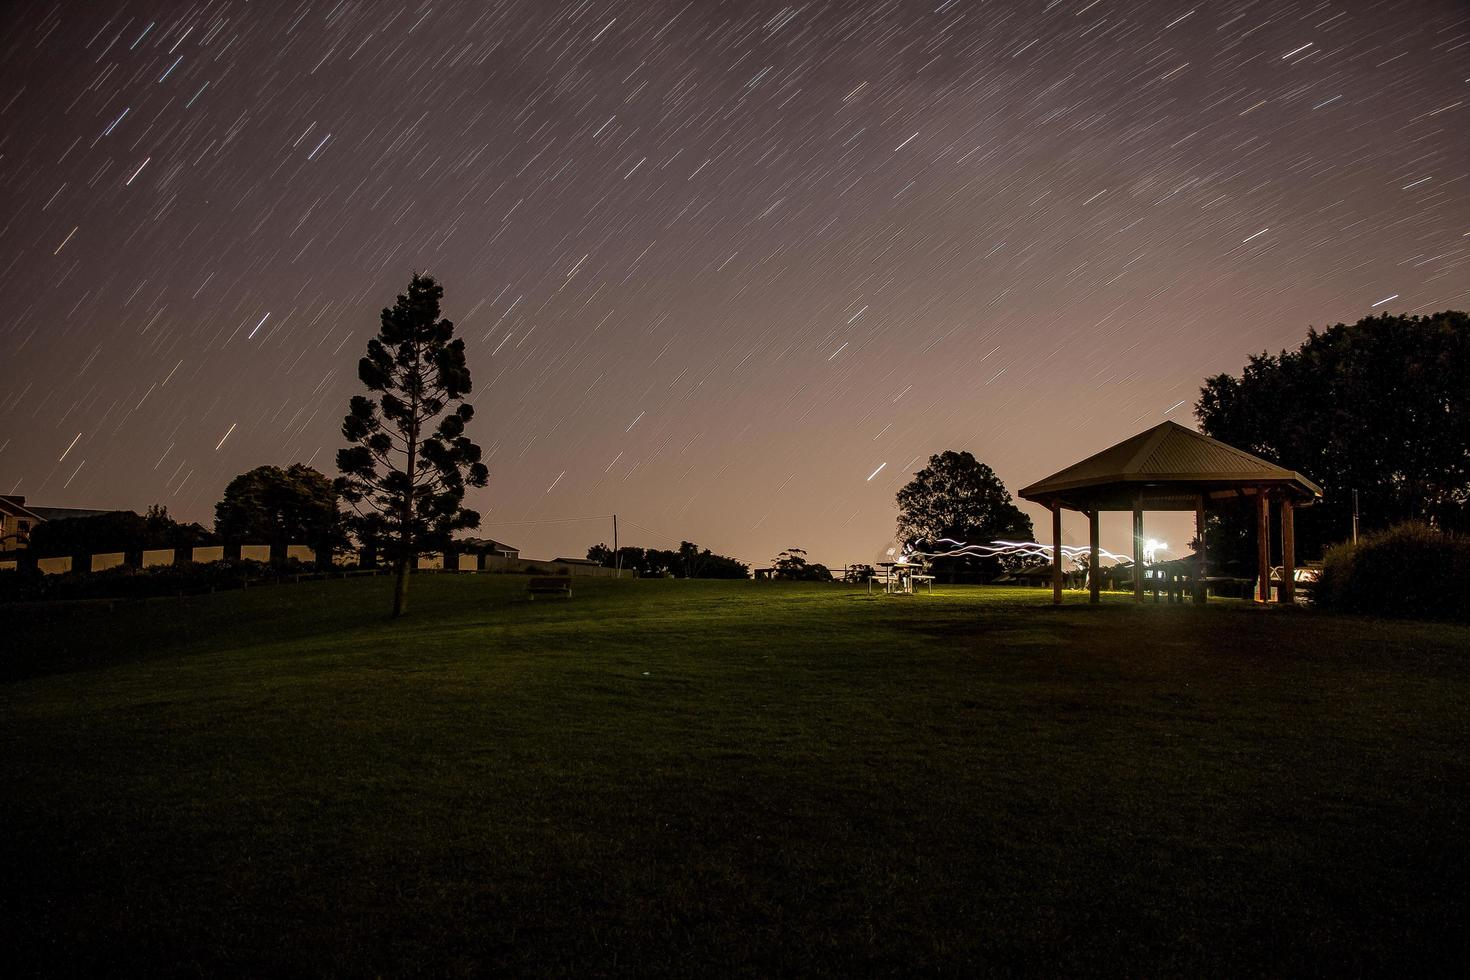 Gazebo marron sous la nuit étoilée photo